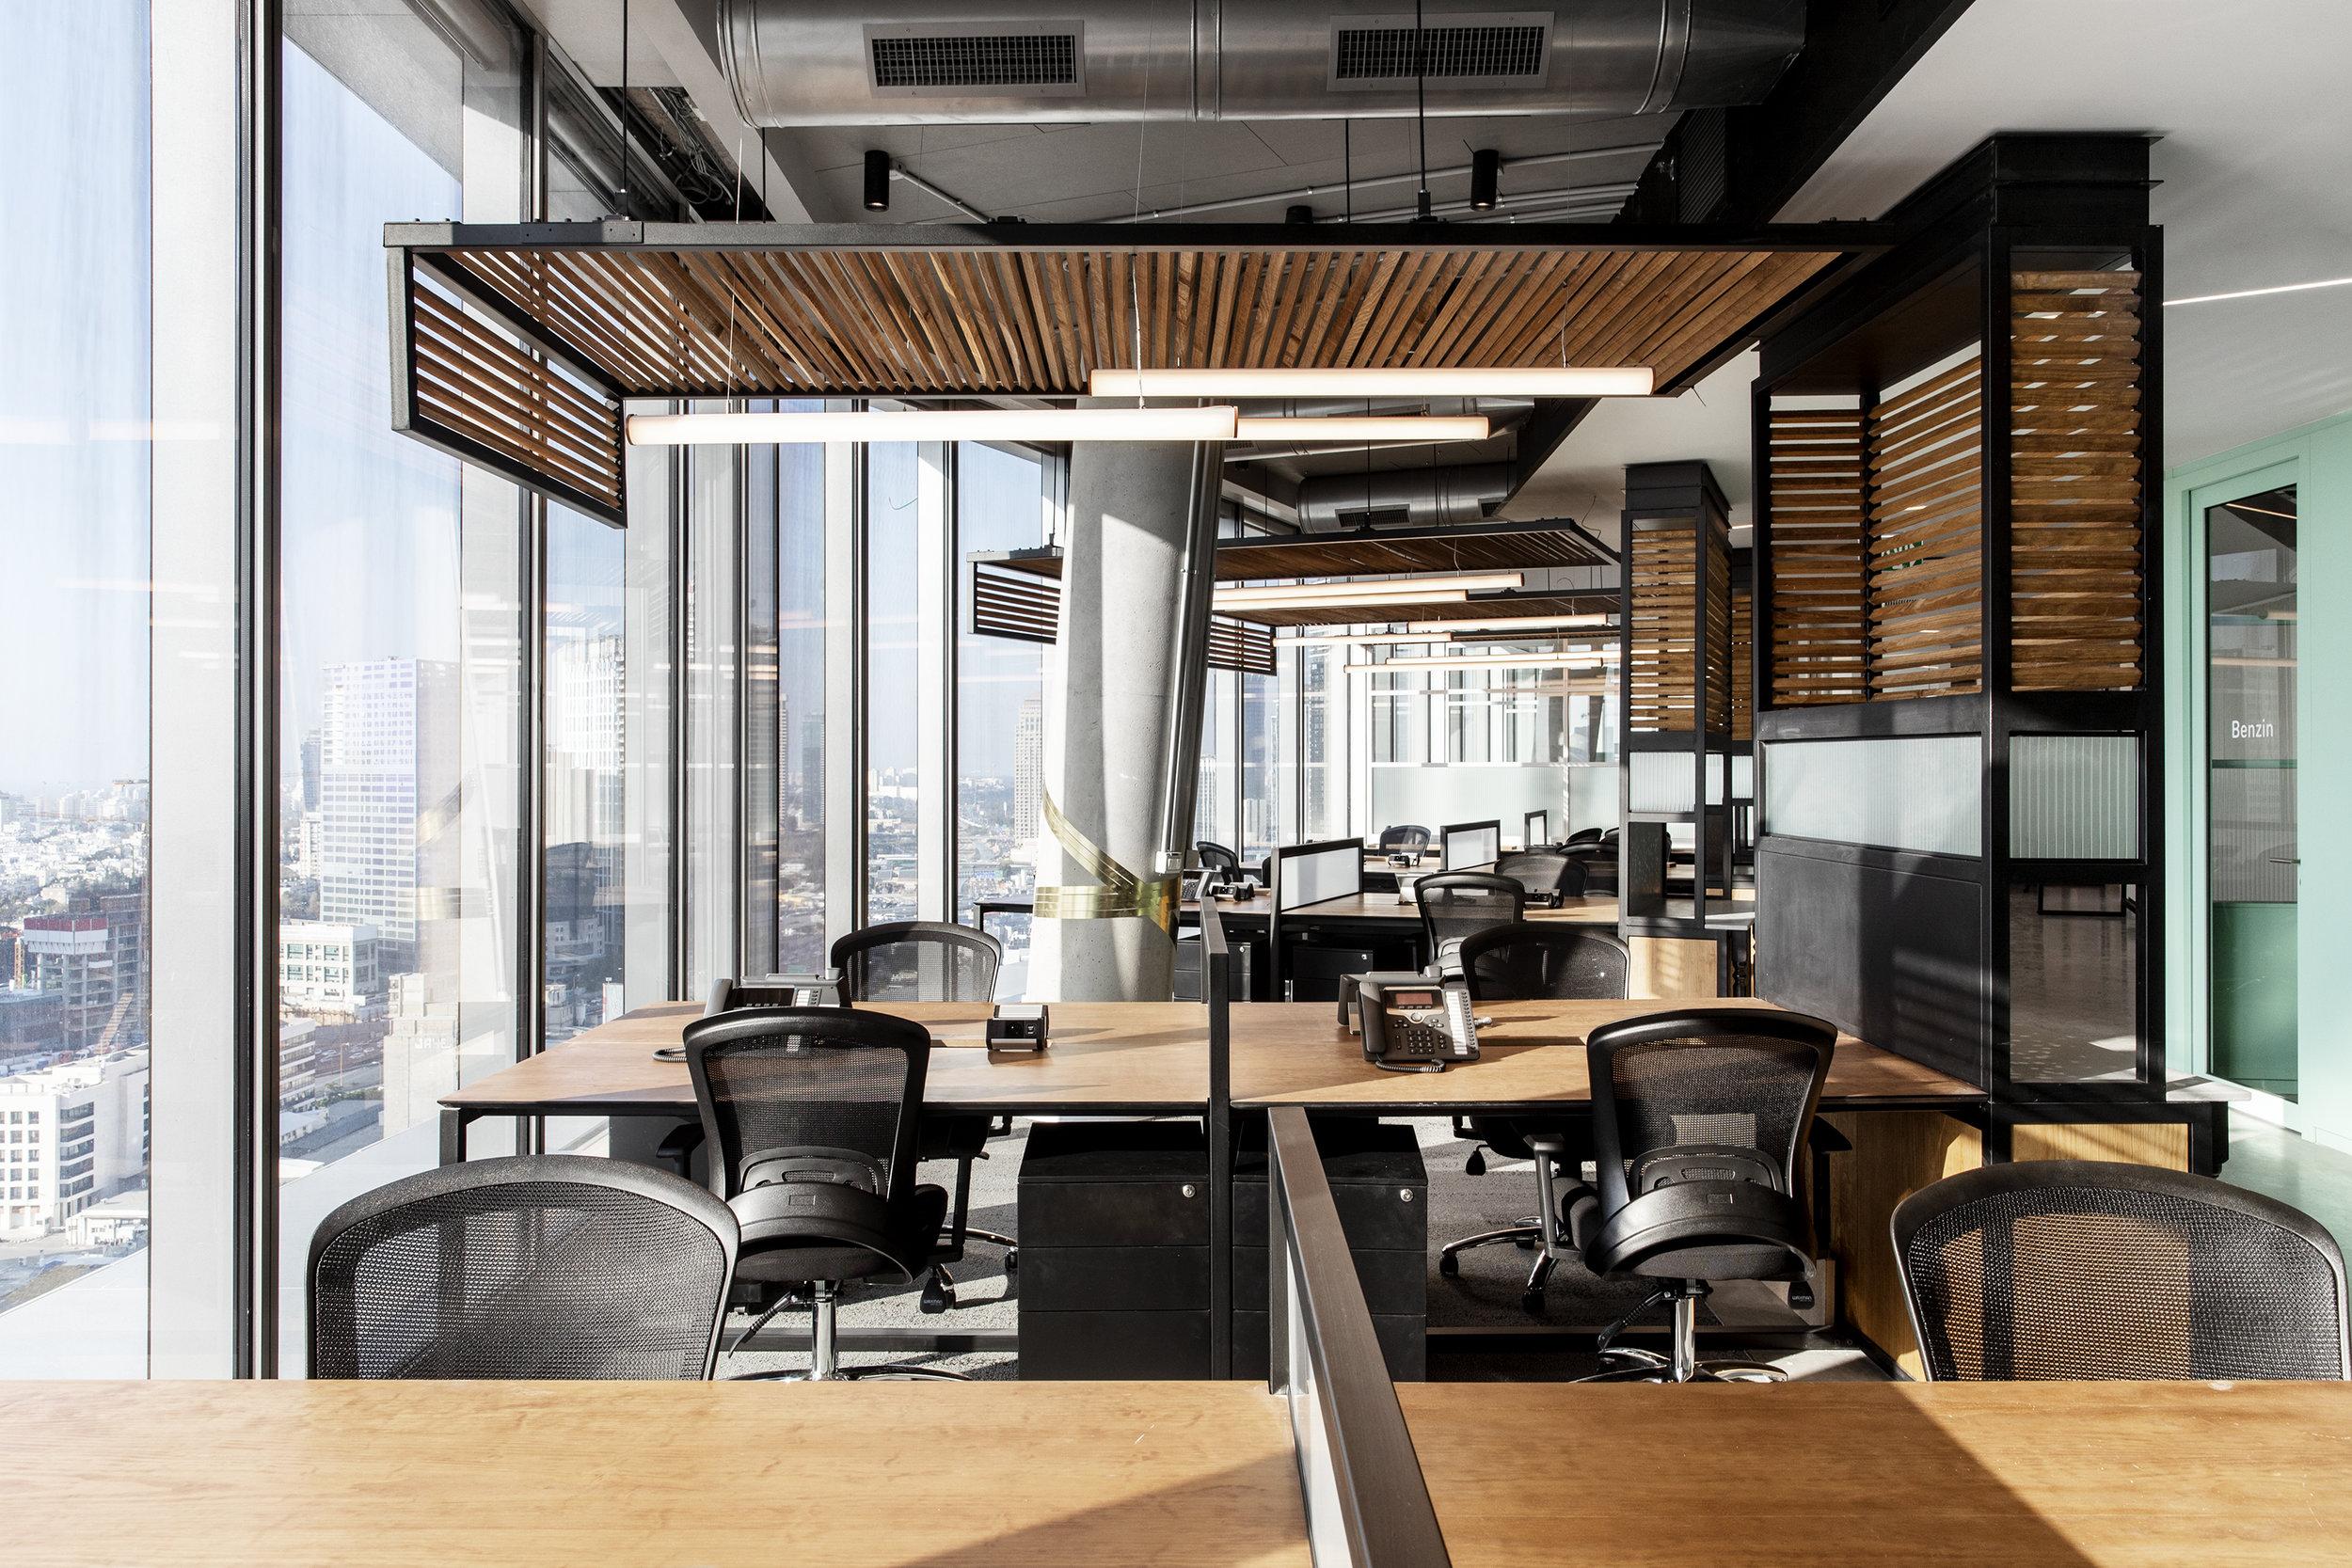 רואי דוד אדריכלות - אדריכל - נטורל אינטליג'נס - ROY DAVID - ARCHITECTURE - ARCHITECT - NI (108).jpg